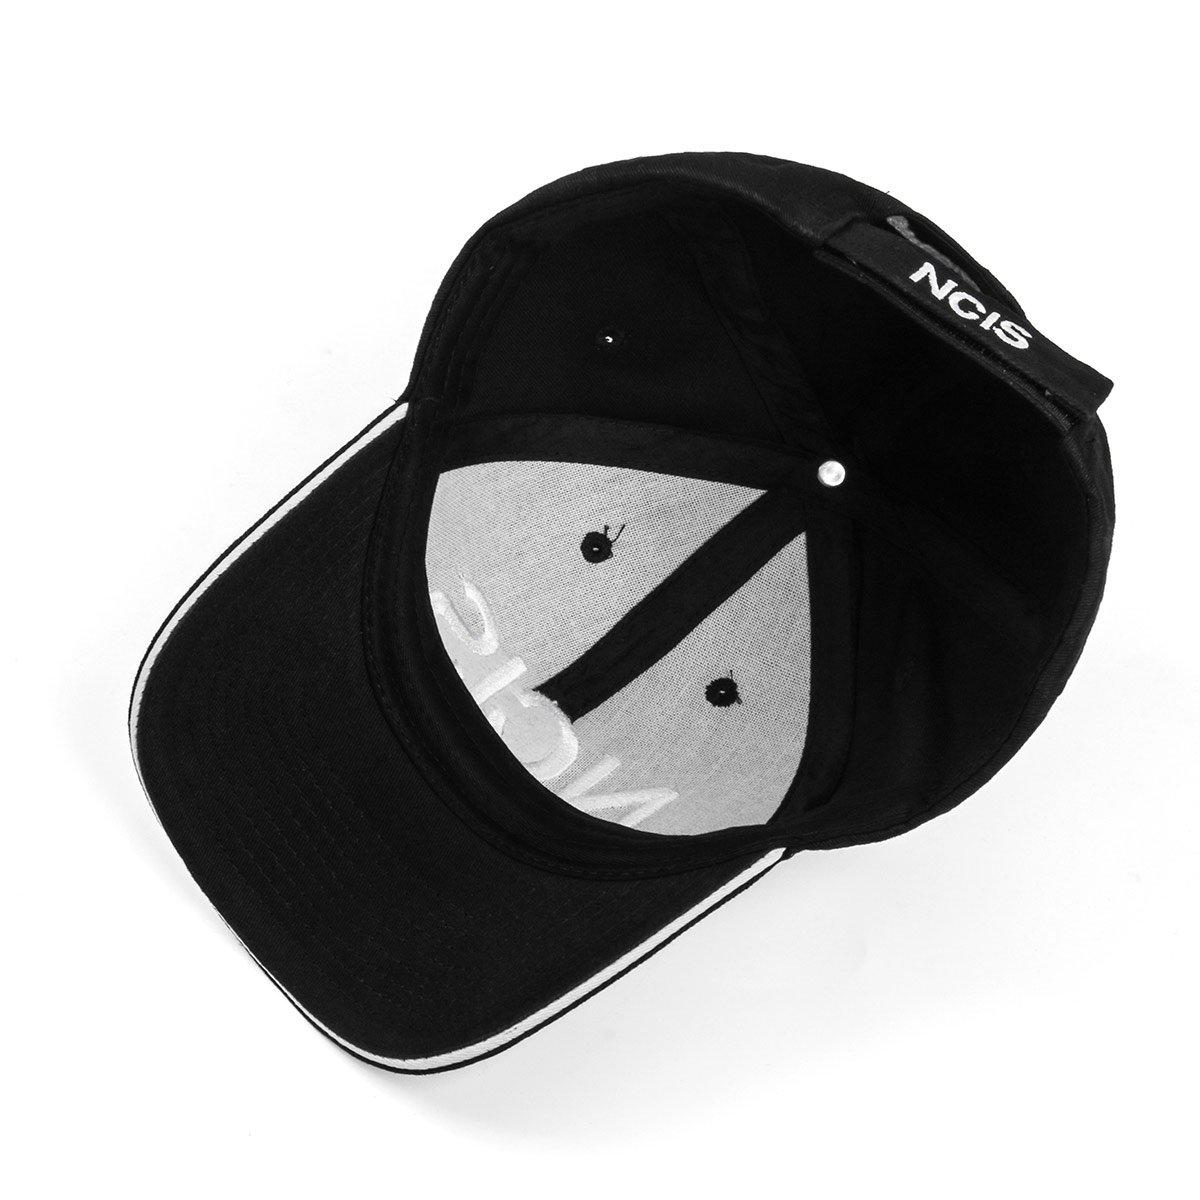 573ab212091d2 Nofonda NCIS Special Agents Cap Naval Criminal Investigative Service  Embroidered Adjustable Cotton Baseball Cap Hat (Black)